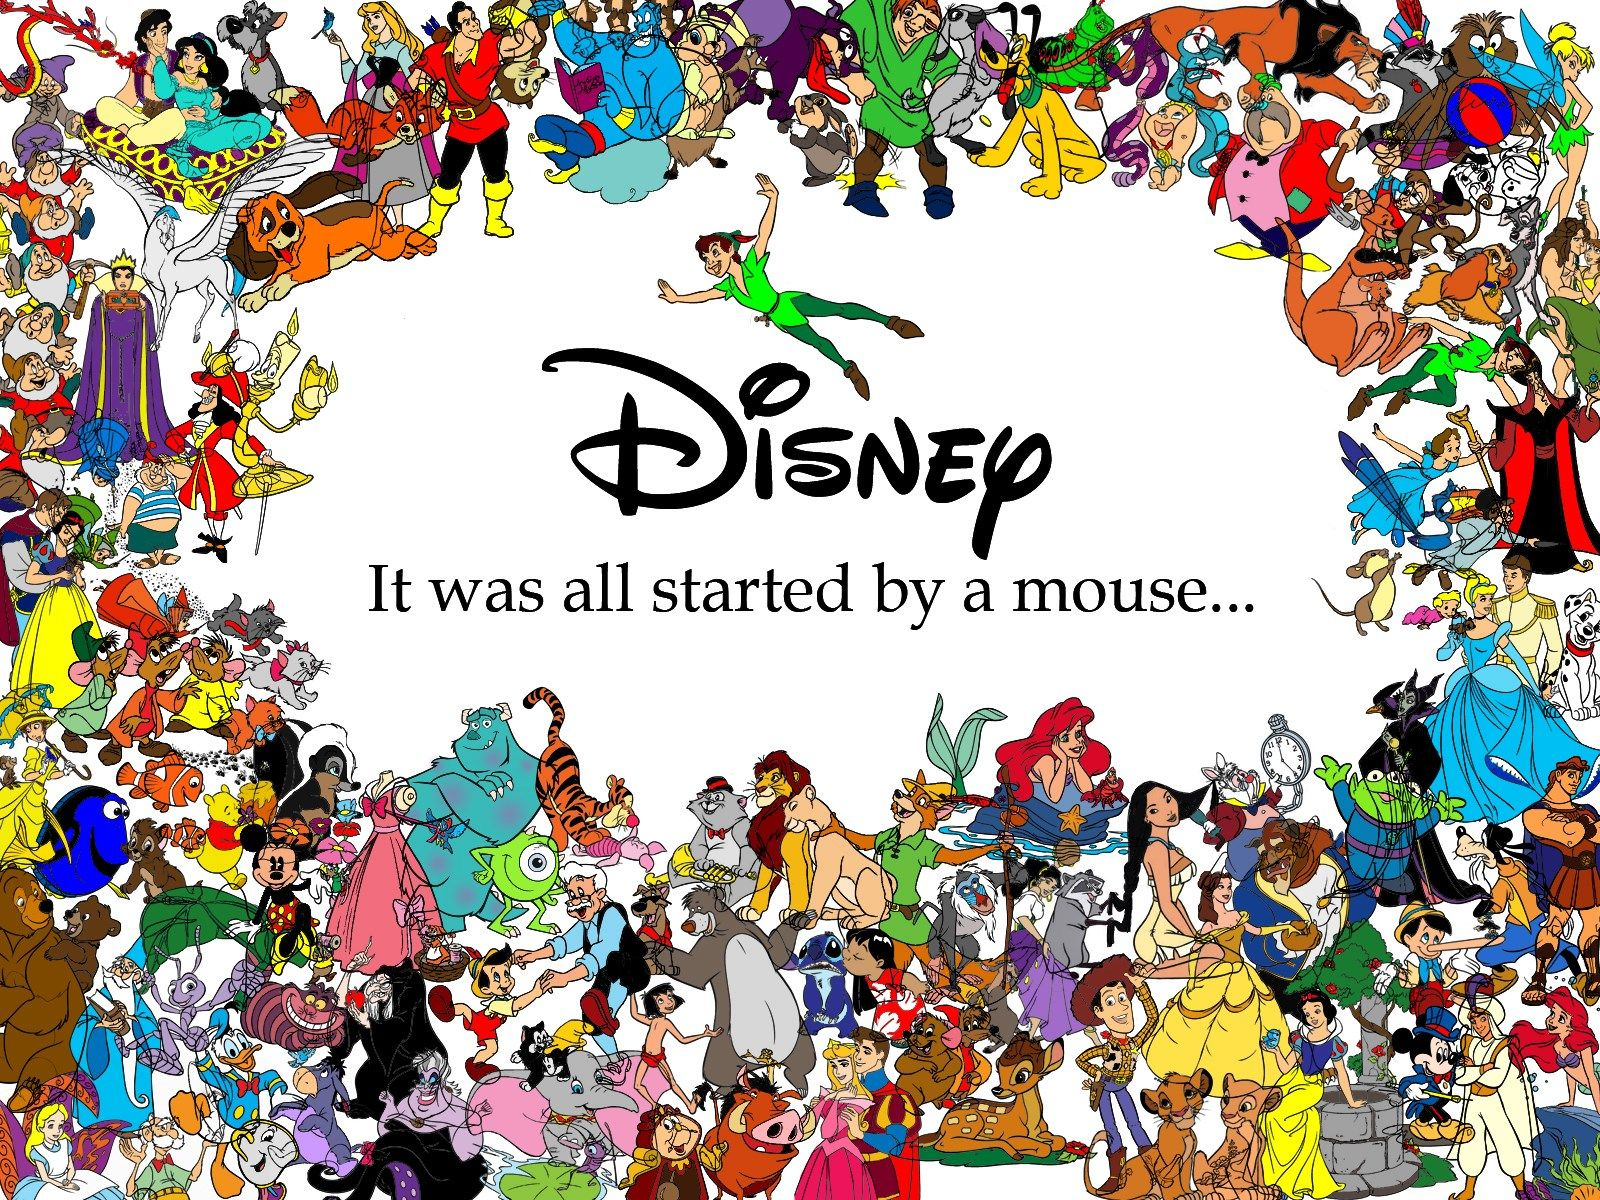 2017 03 19 Disney Free Desktop Wallpaper 1590491 All Disney Characters Disney Songs Classic Disney